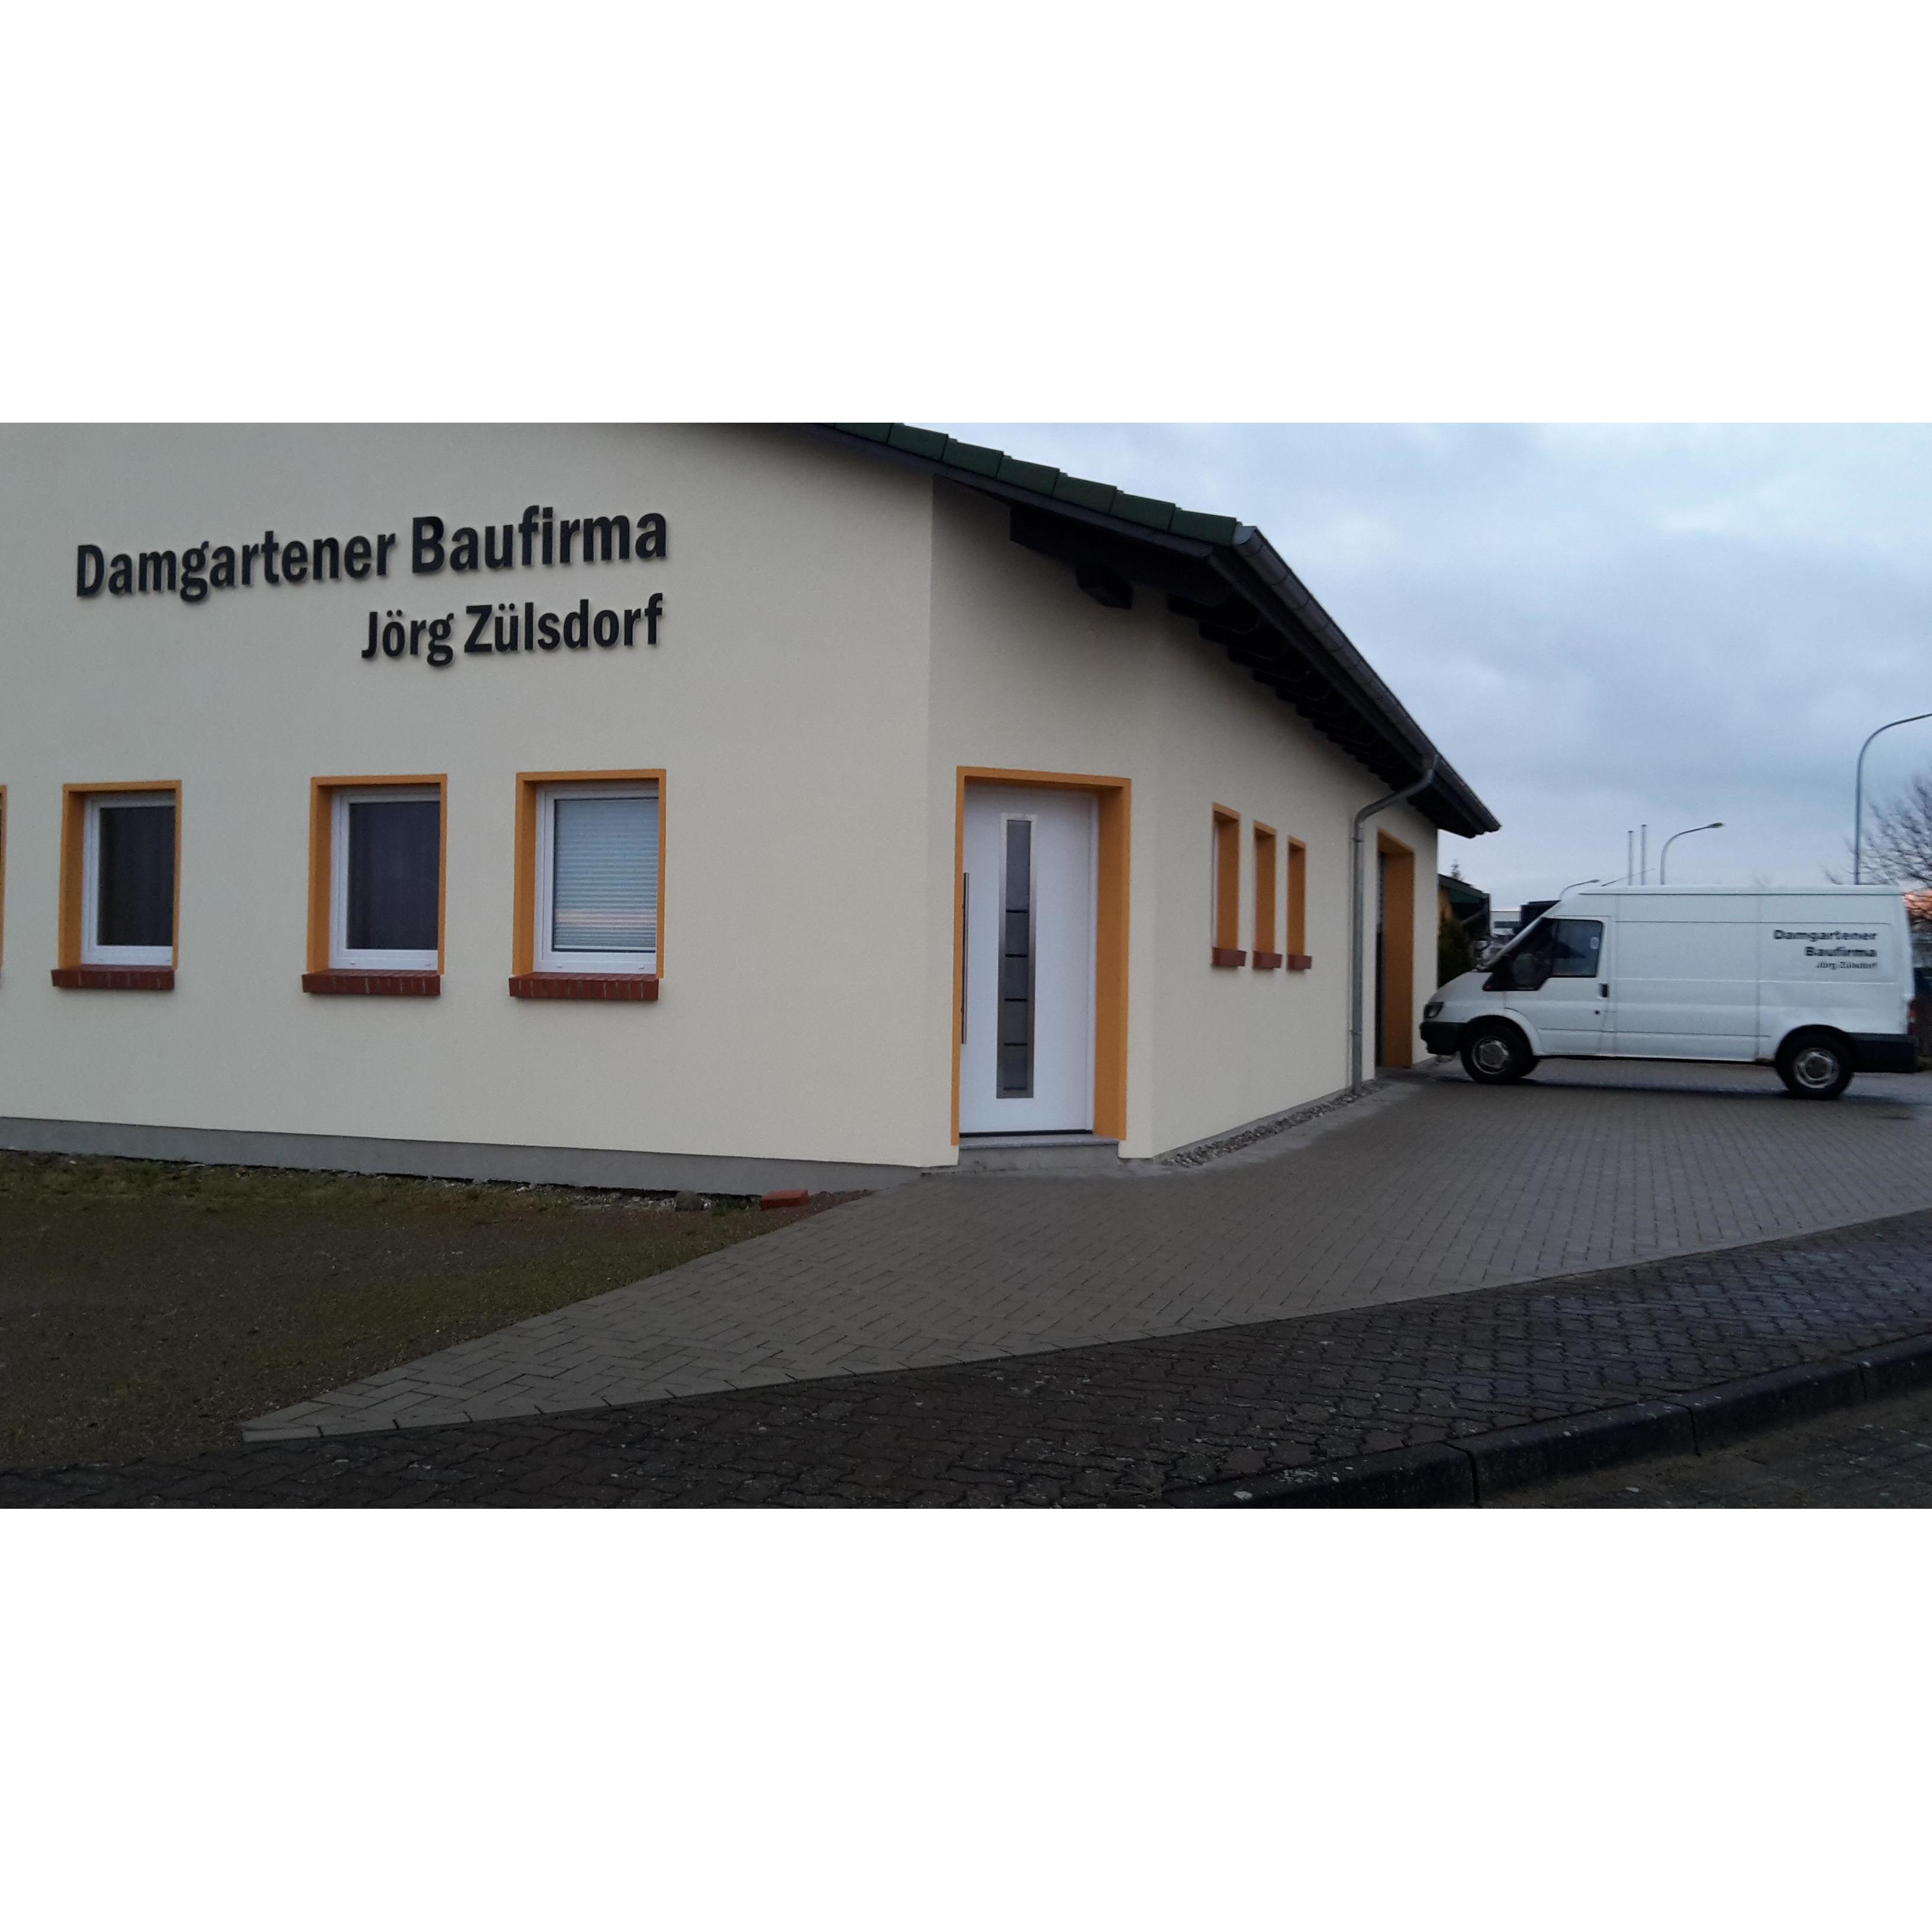 damgartener baufirma meisterbetrieb z lsdorf bauunternehmen ribnitz damgarten deutschland. Black Bedroom Furniture Sets. Home Design Ideas